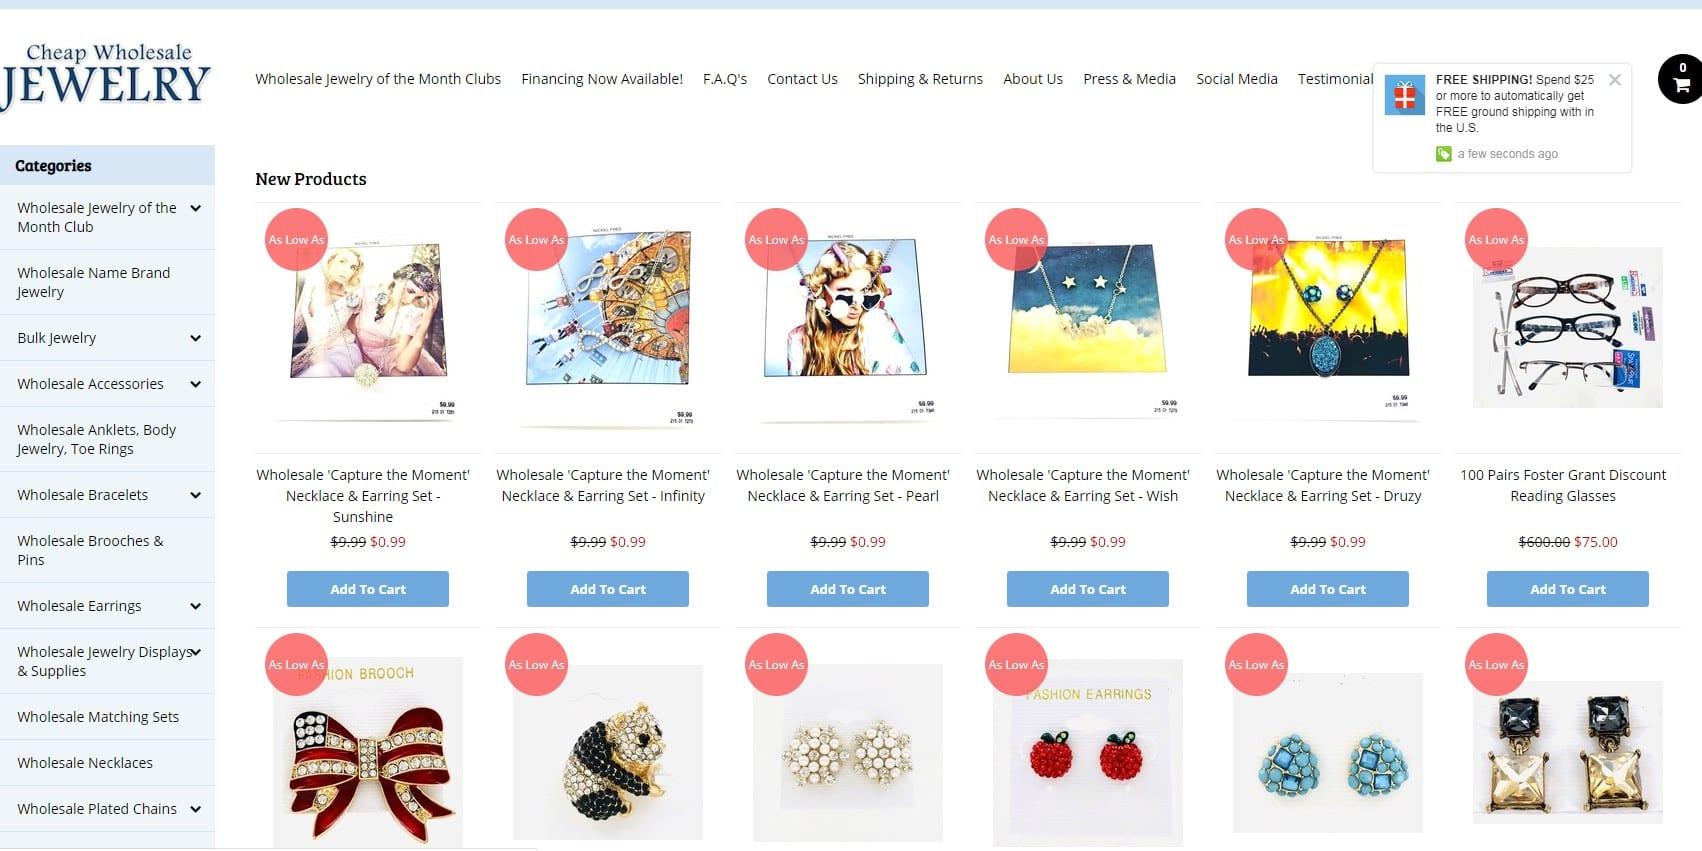 Cheap Wholesale Jewelry homepage